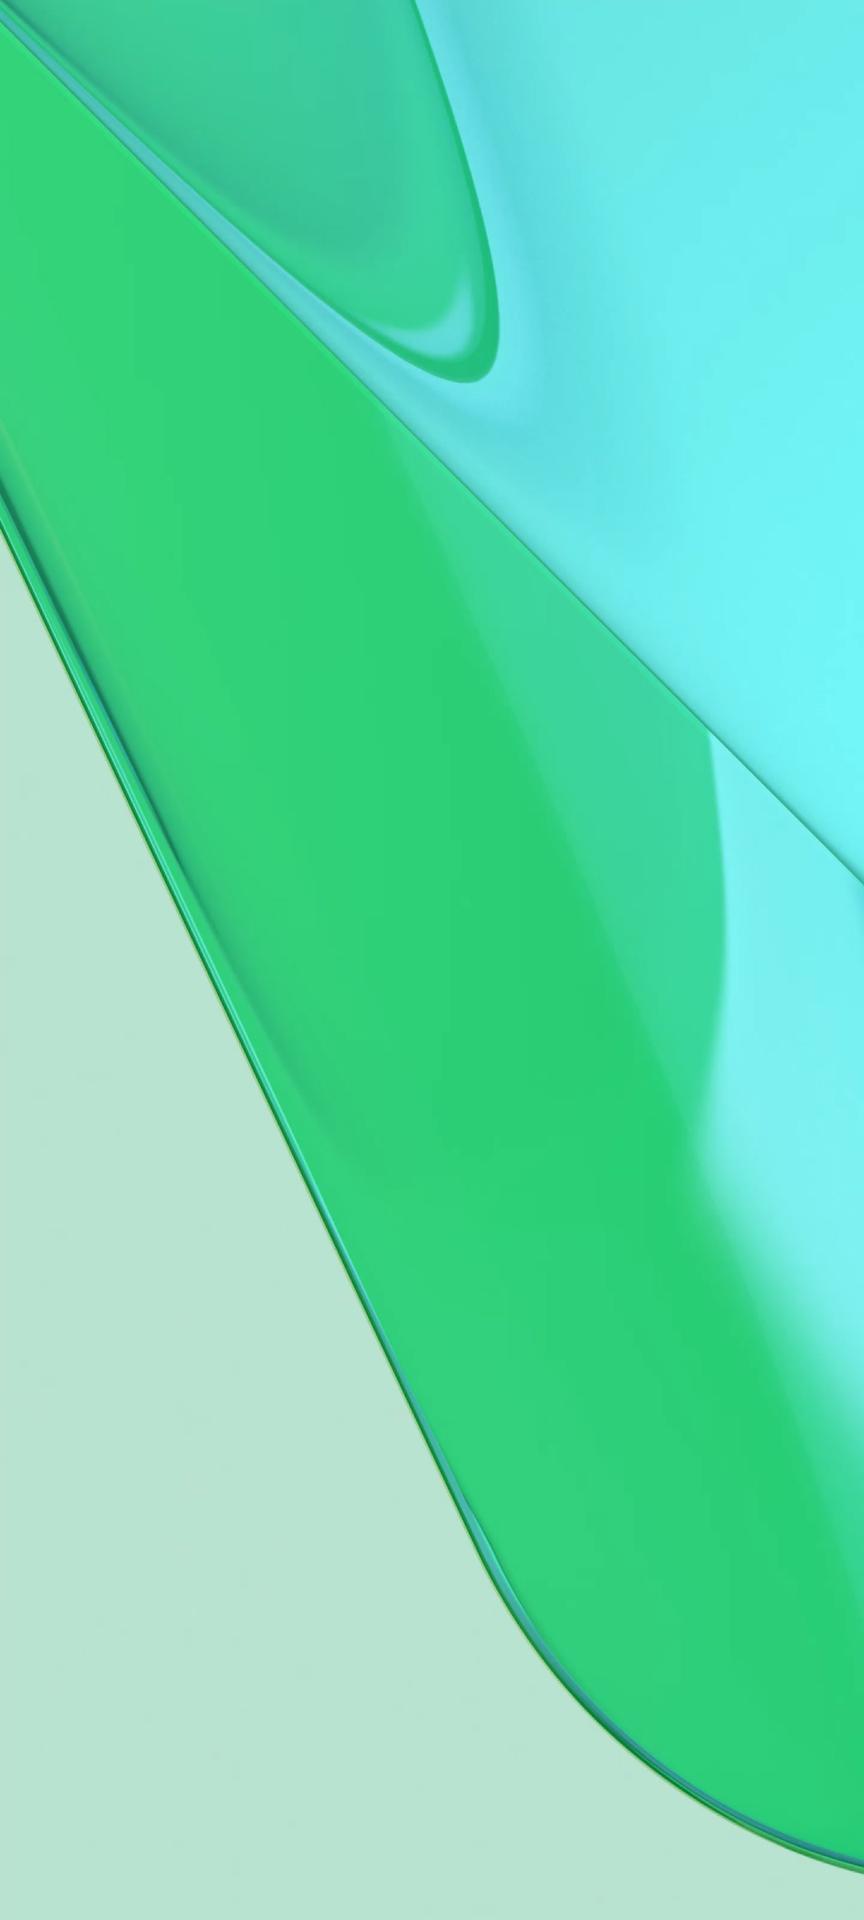 OnePlus 9 wallpaper 8